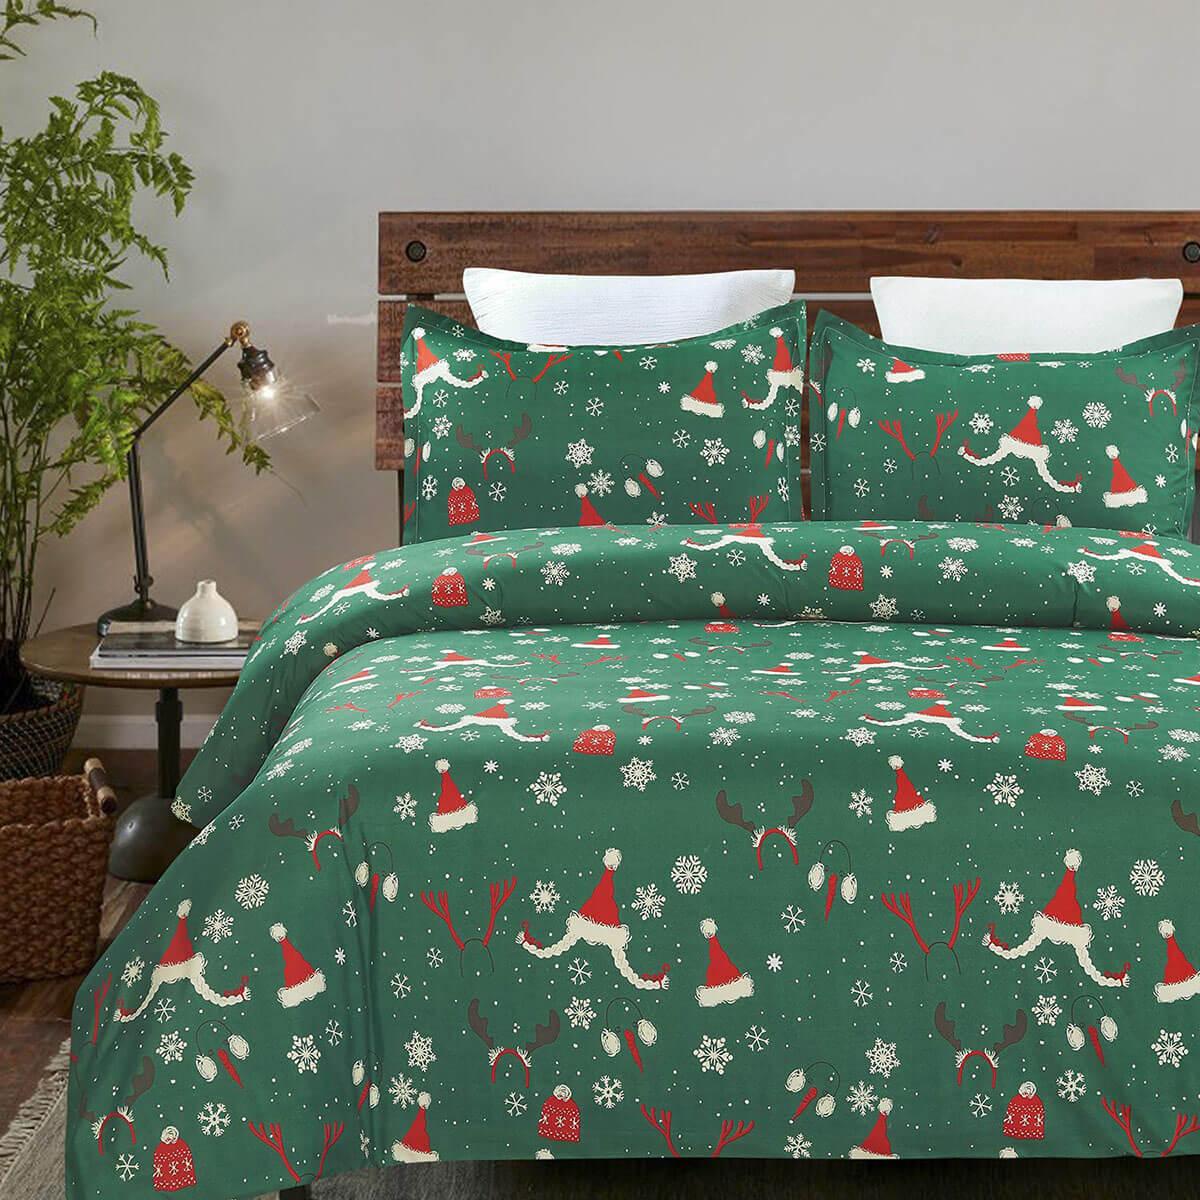 Festive Holiday-Patterned Bedding Sets